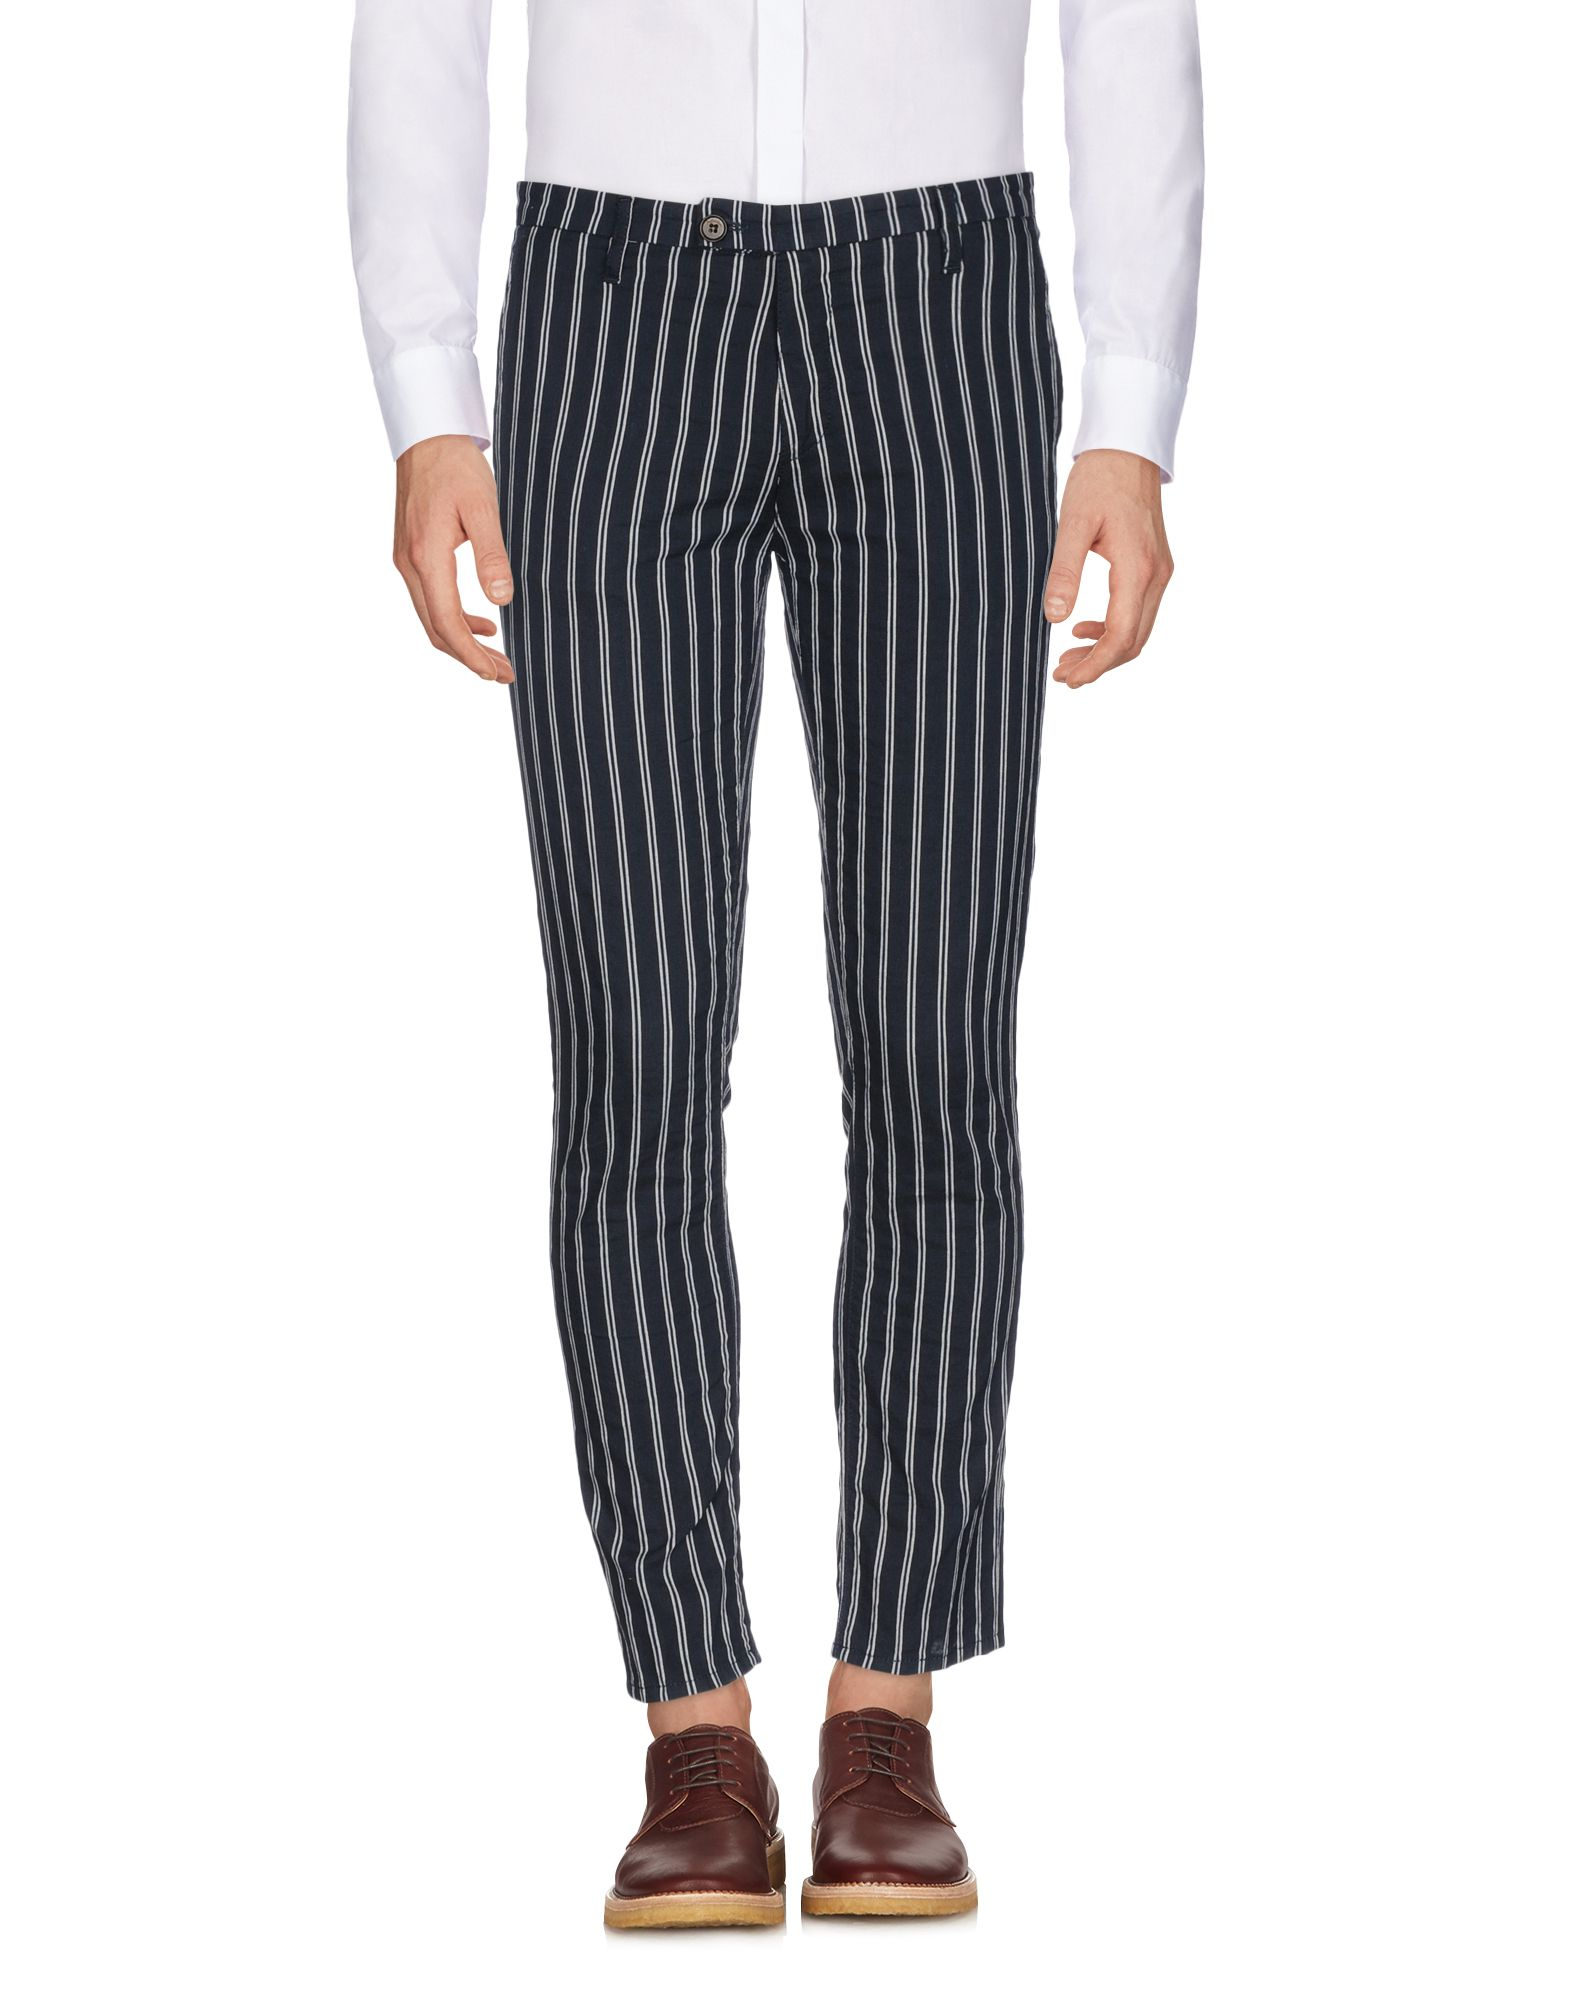 Pantalone Individual Uomo - Acquista online su